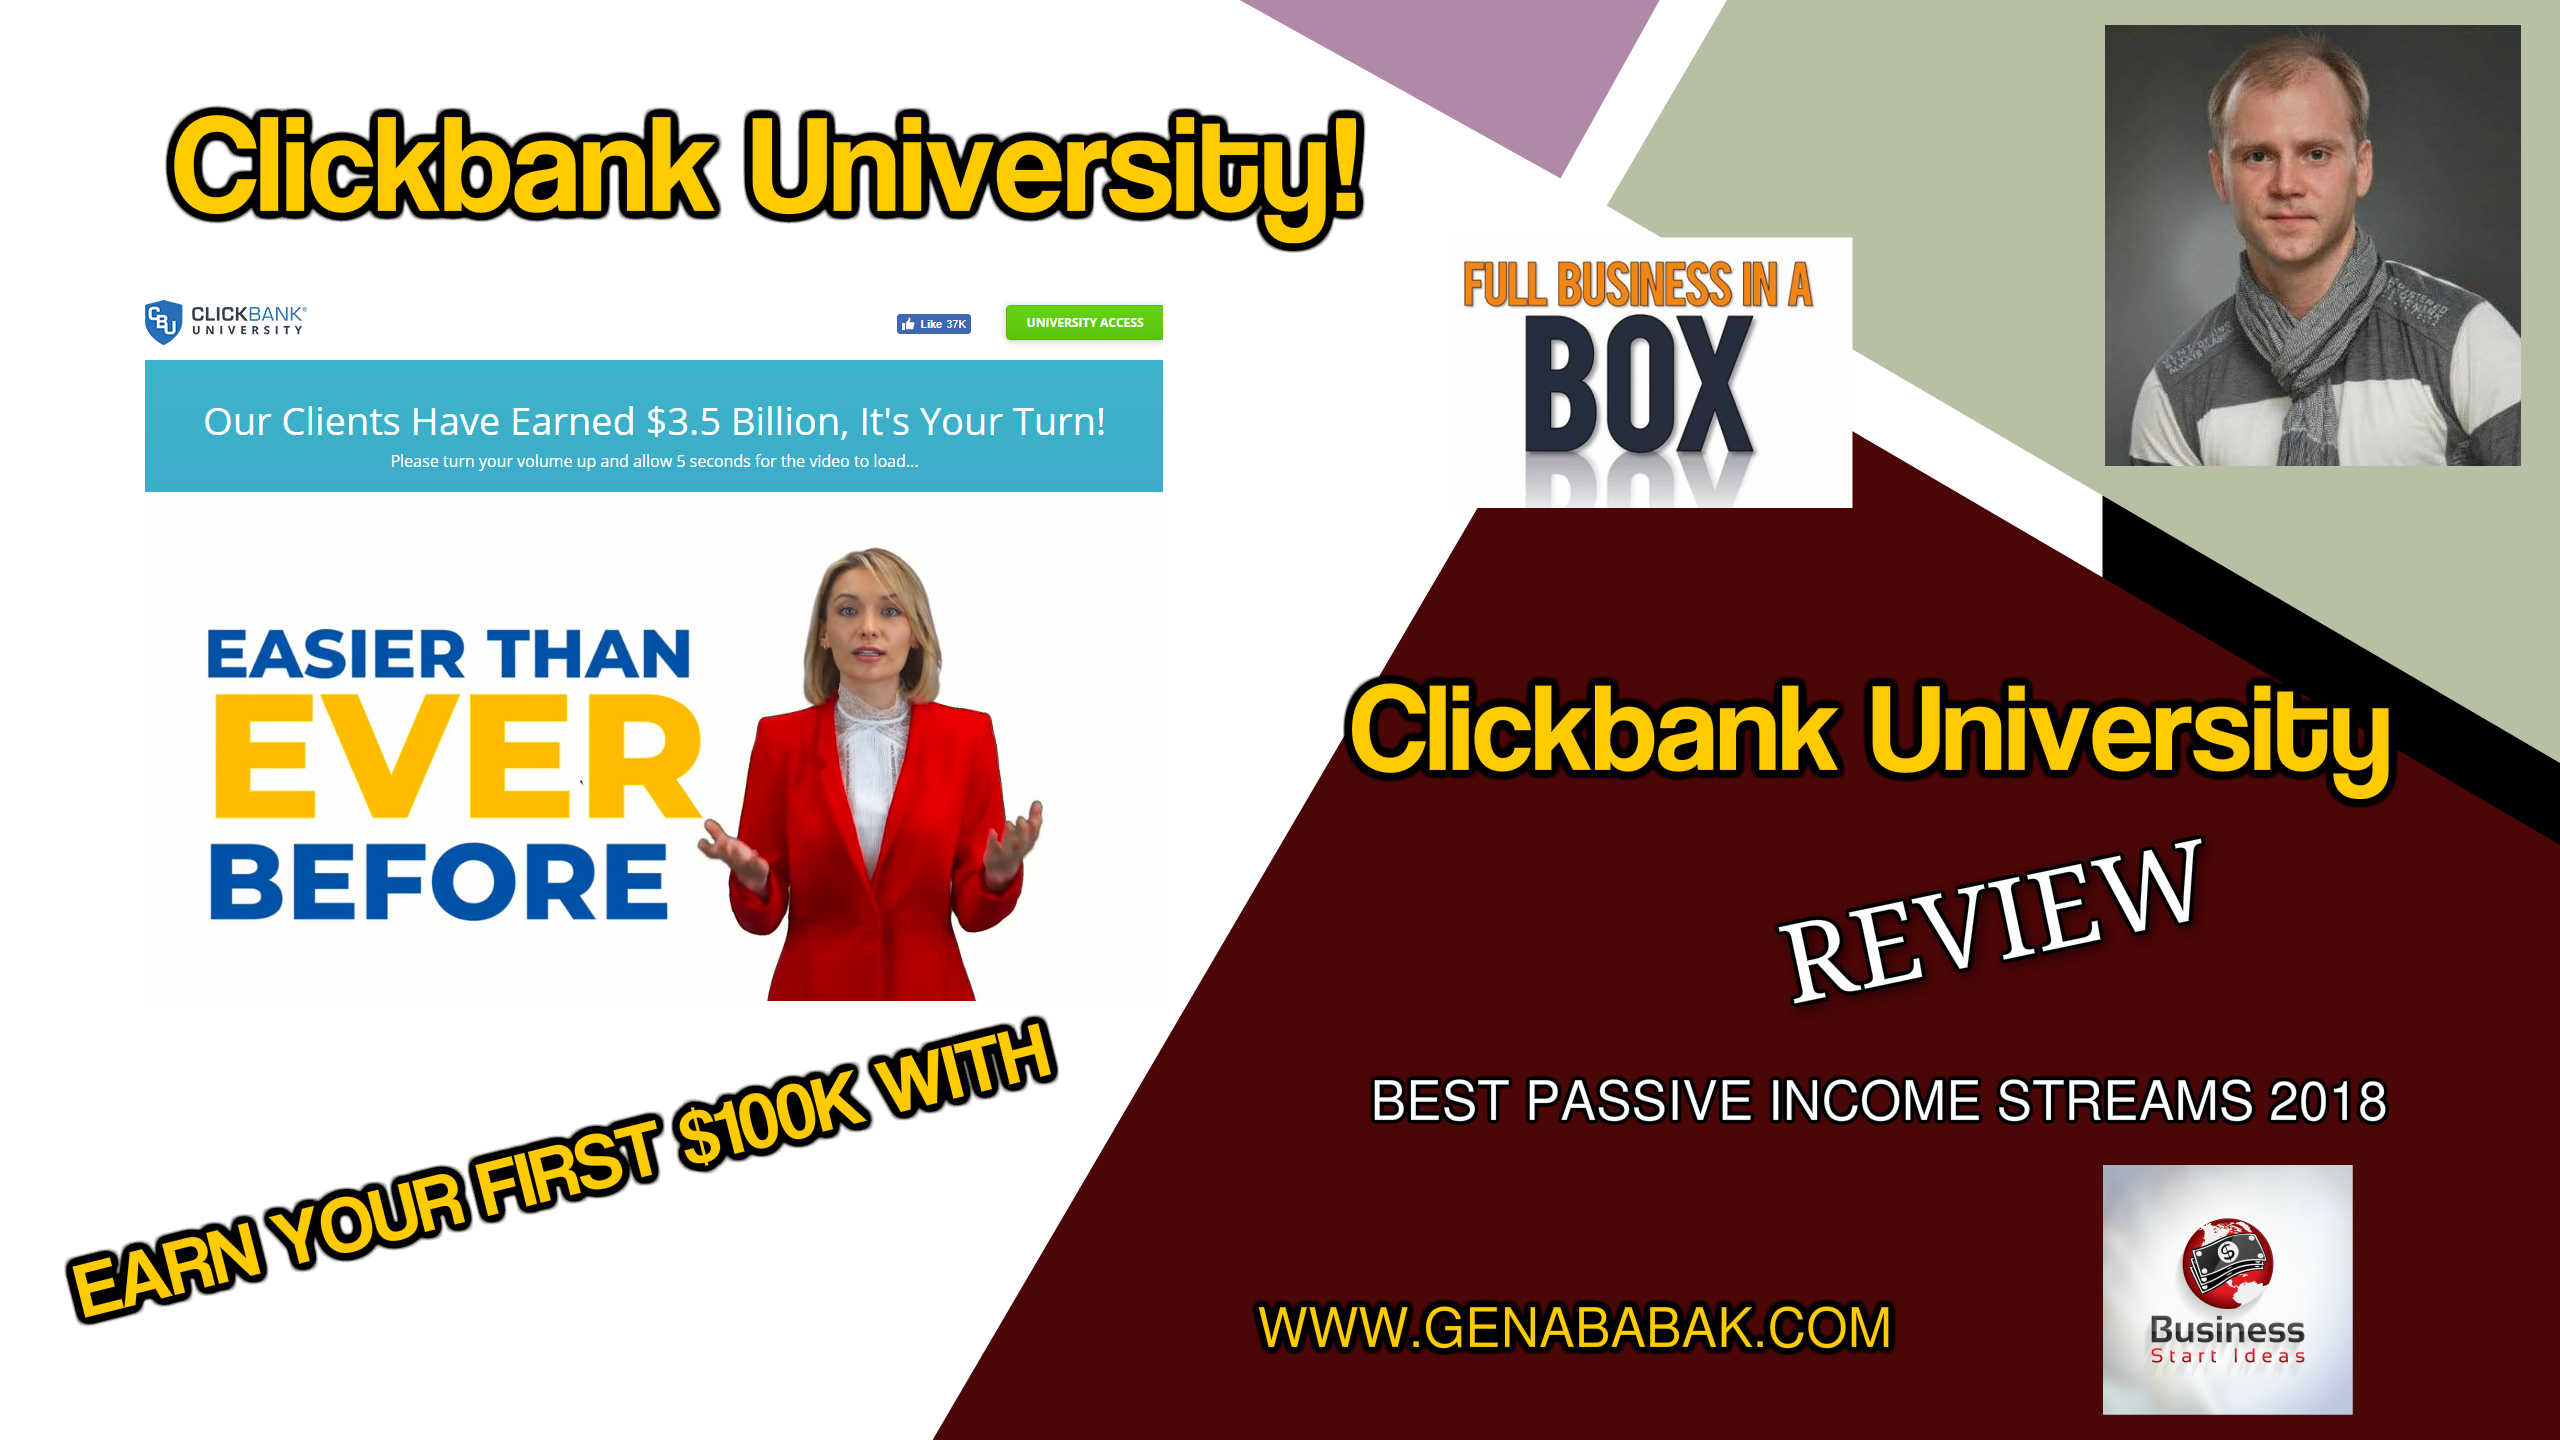 Clickbank University Review 2018 by Gena Babak